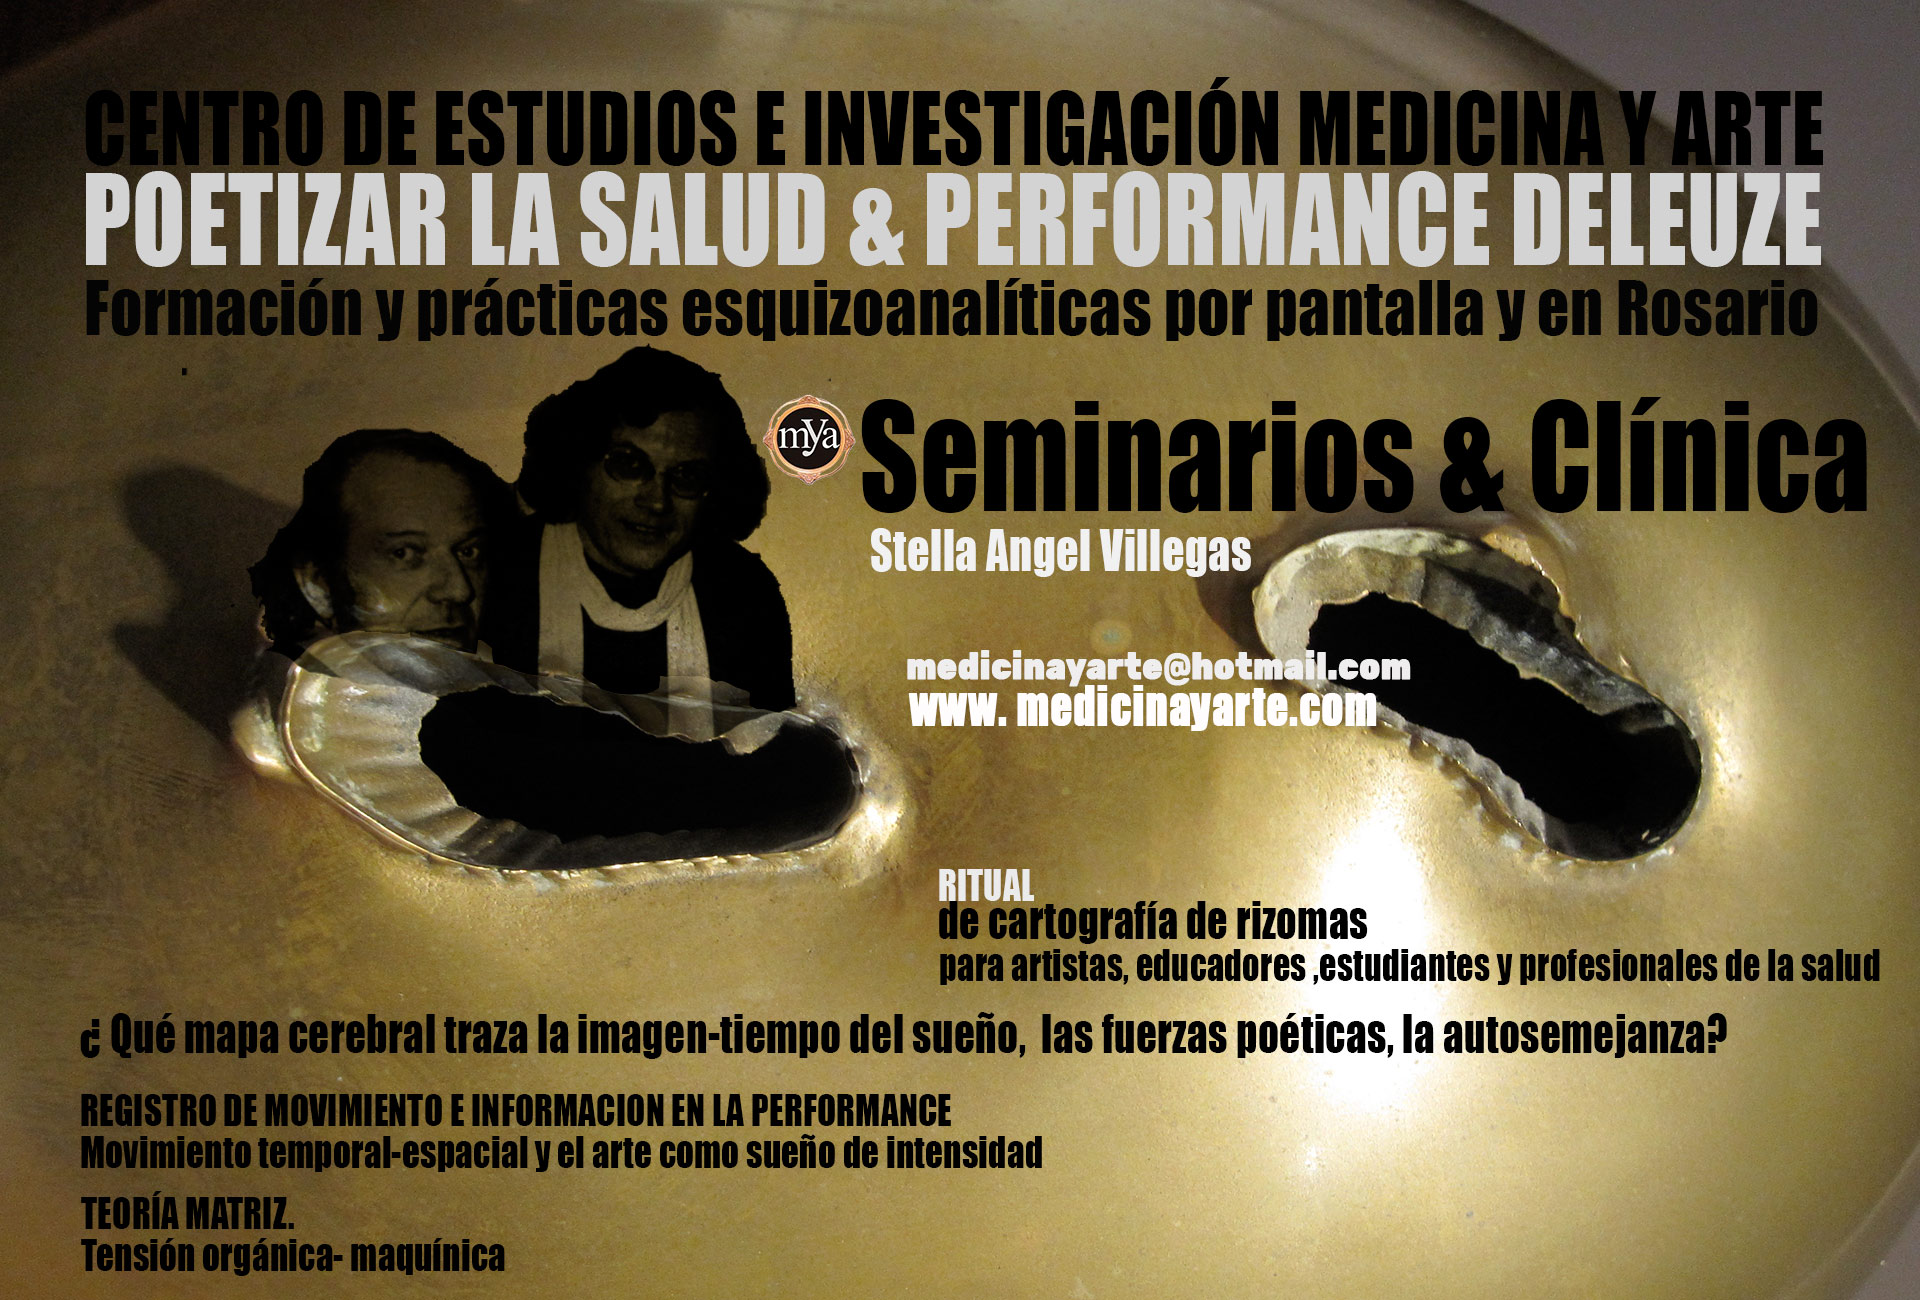 http://medicinayarte.com/img/poetizar_la_Salud_Performance_Deleuze.jpg